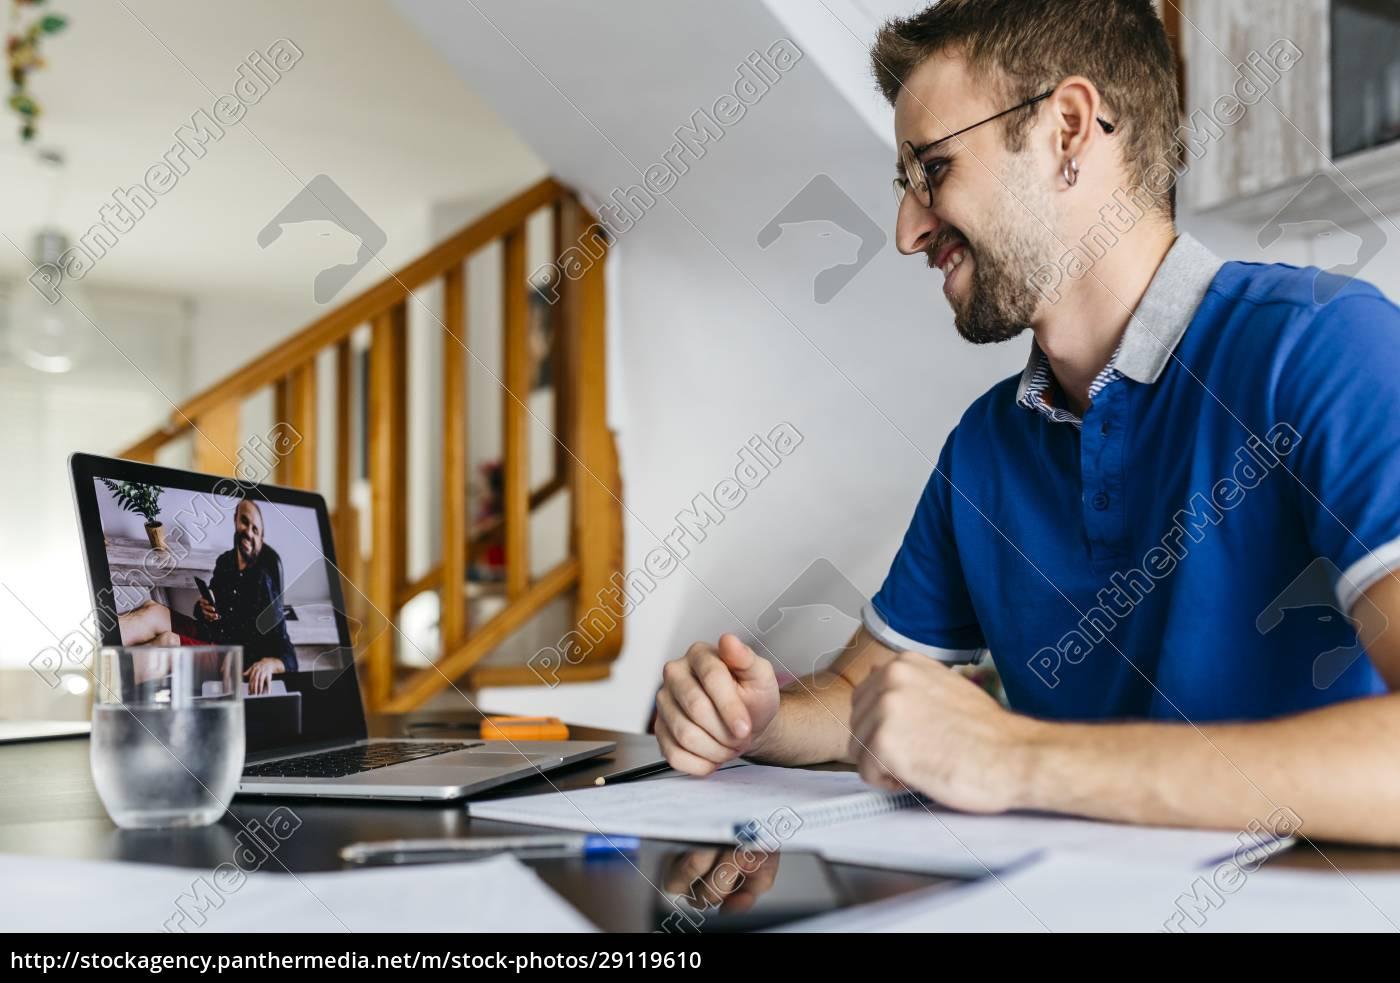 lächelnder, mann, berät, professor, per, videoanruf - 29119610